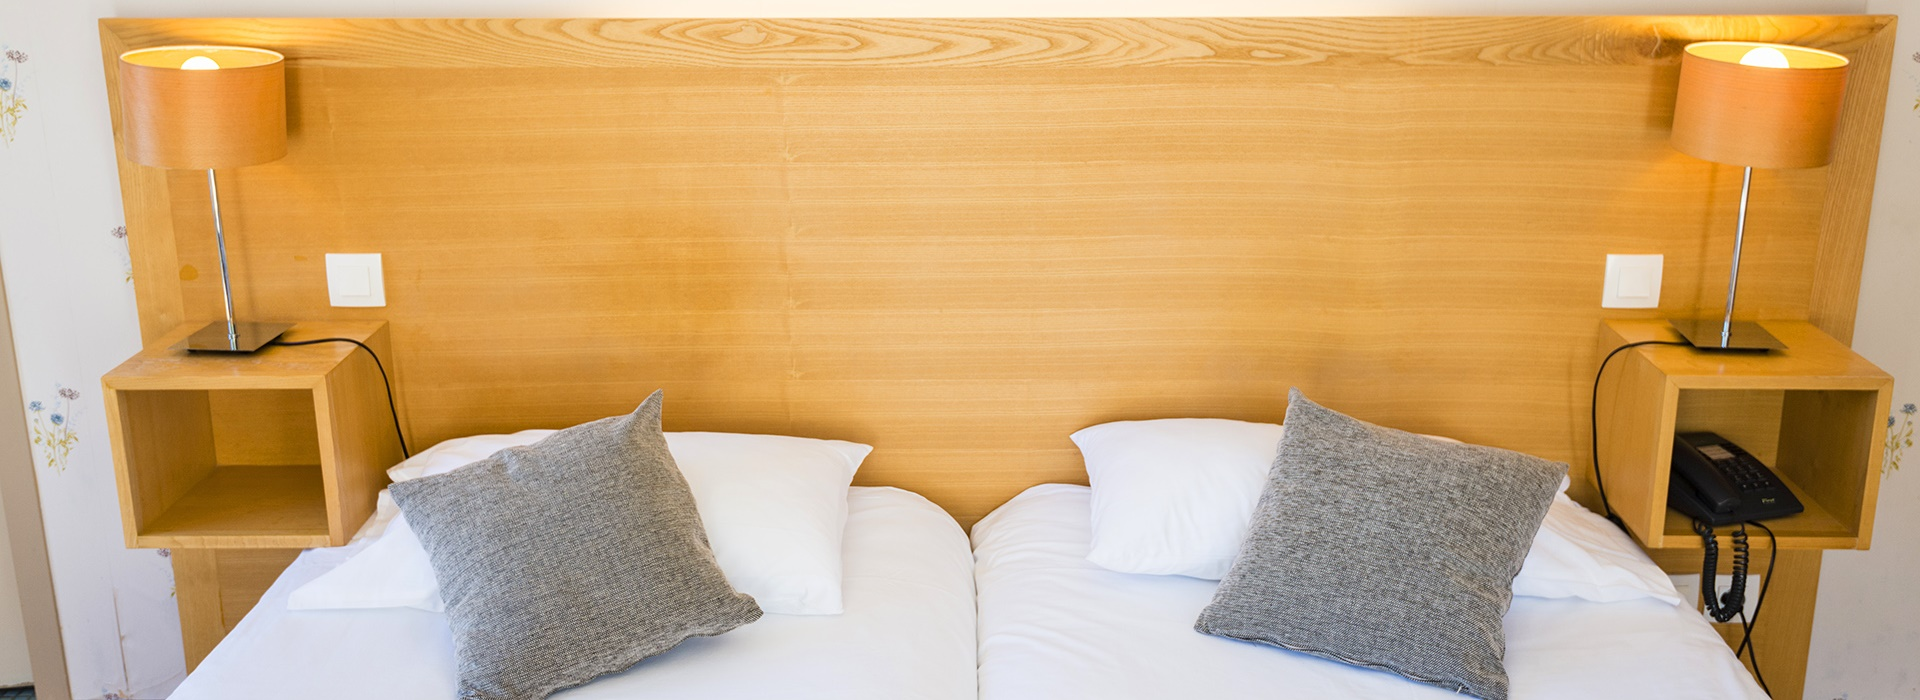 chambre prestige h tel le chalet ax les thermes. Black Bedroom Furniture Sets. Home Design Ideas